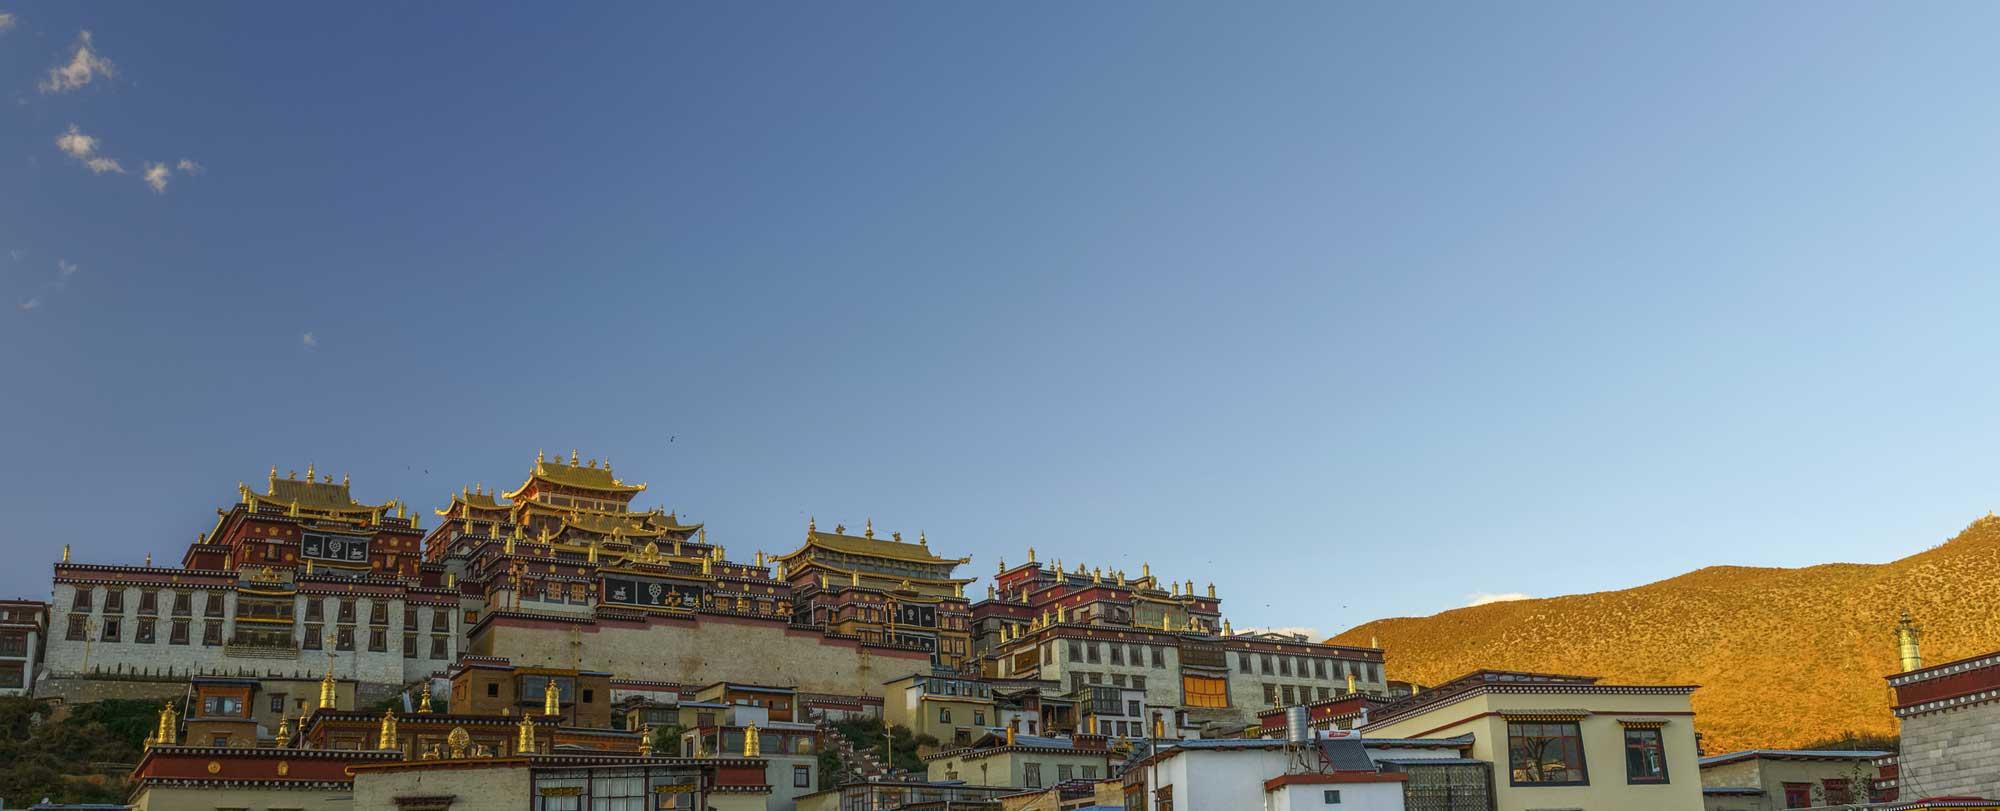 tibet temple 104396618